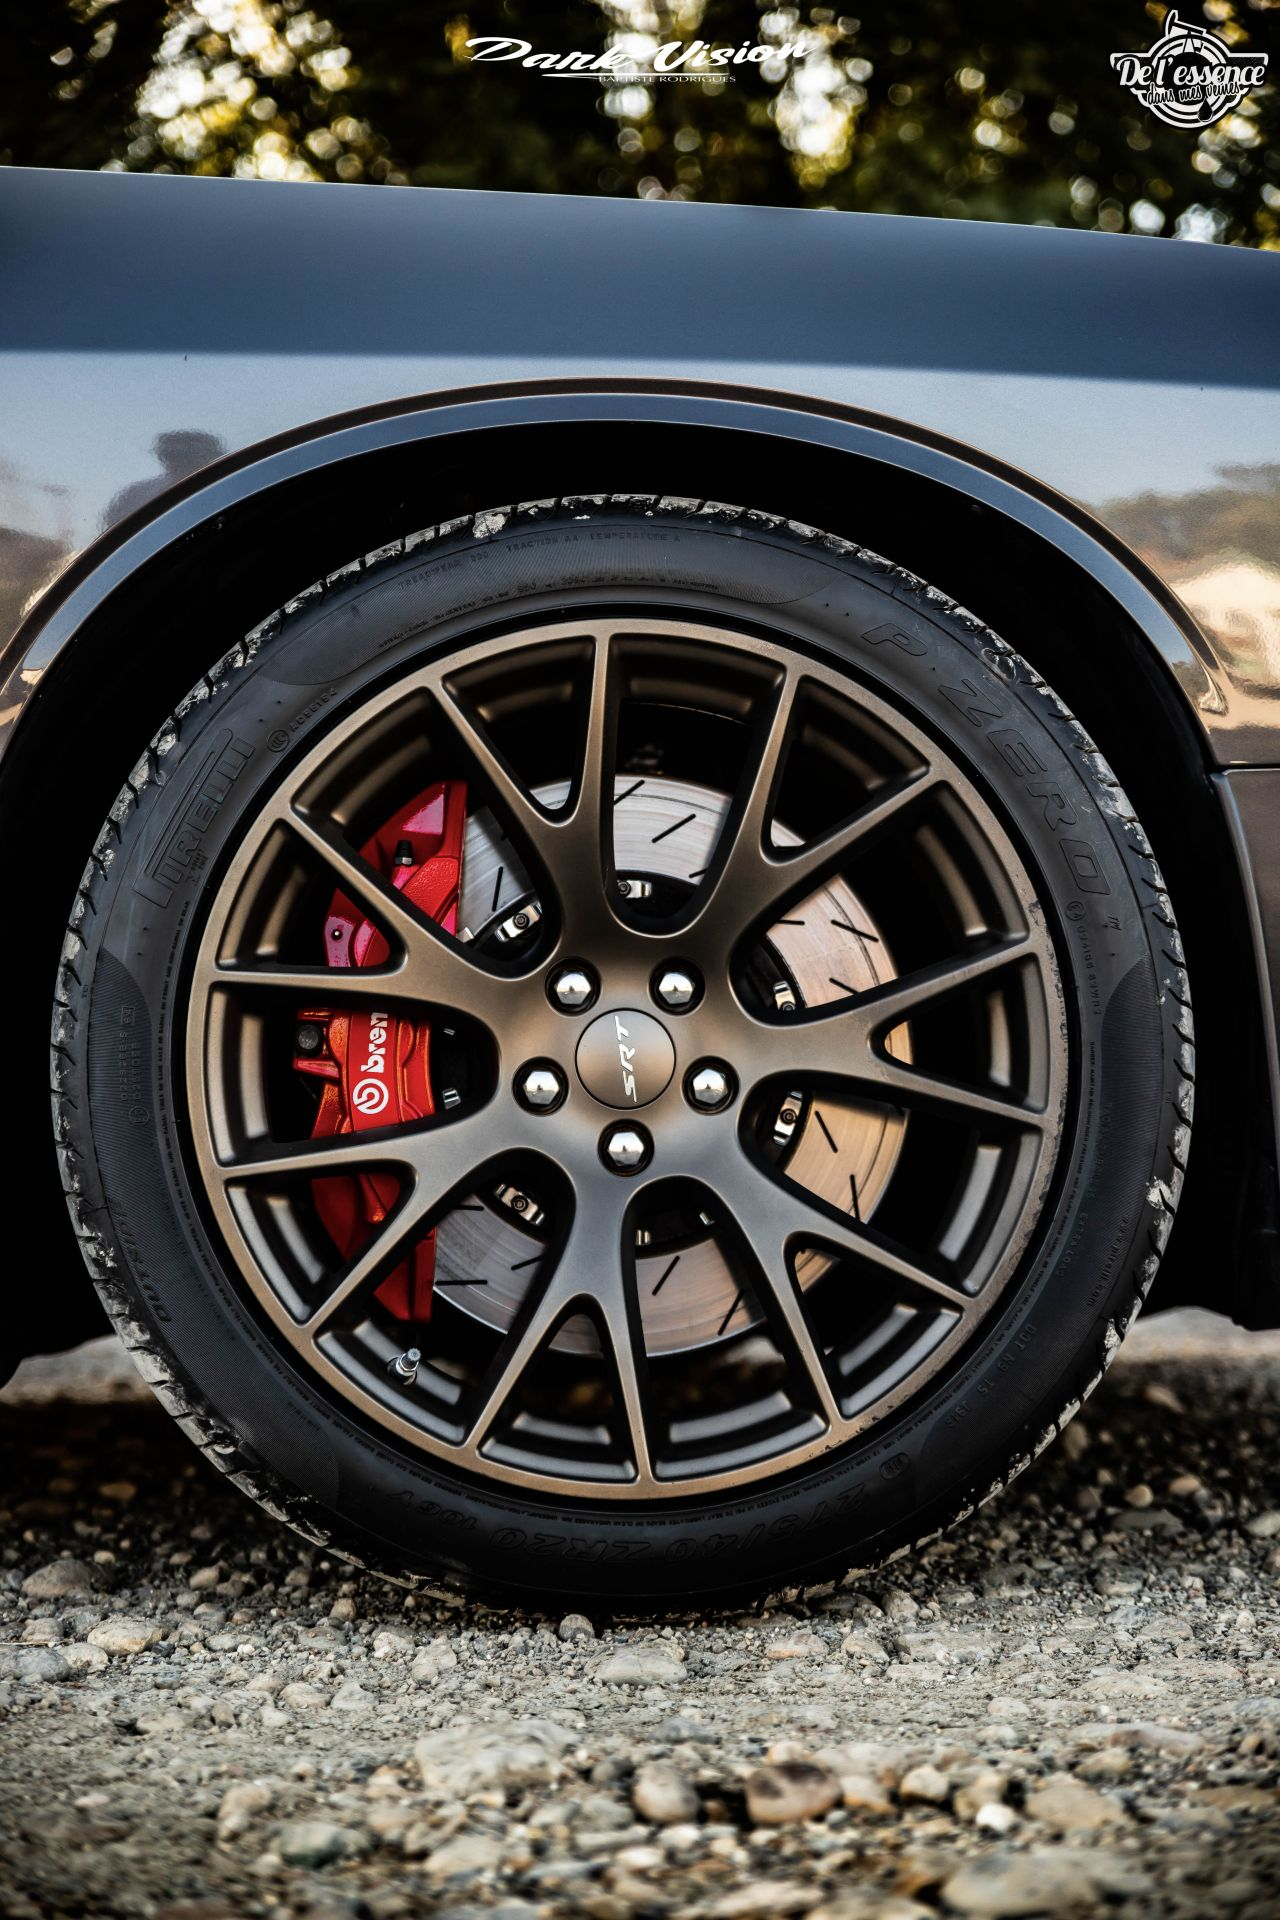 Dodge Challenger Hellcat de 2016 - Elle vous met des beignes ! 34